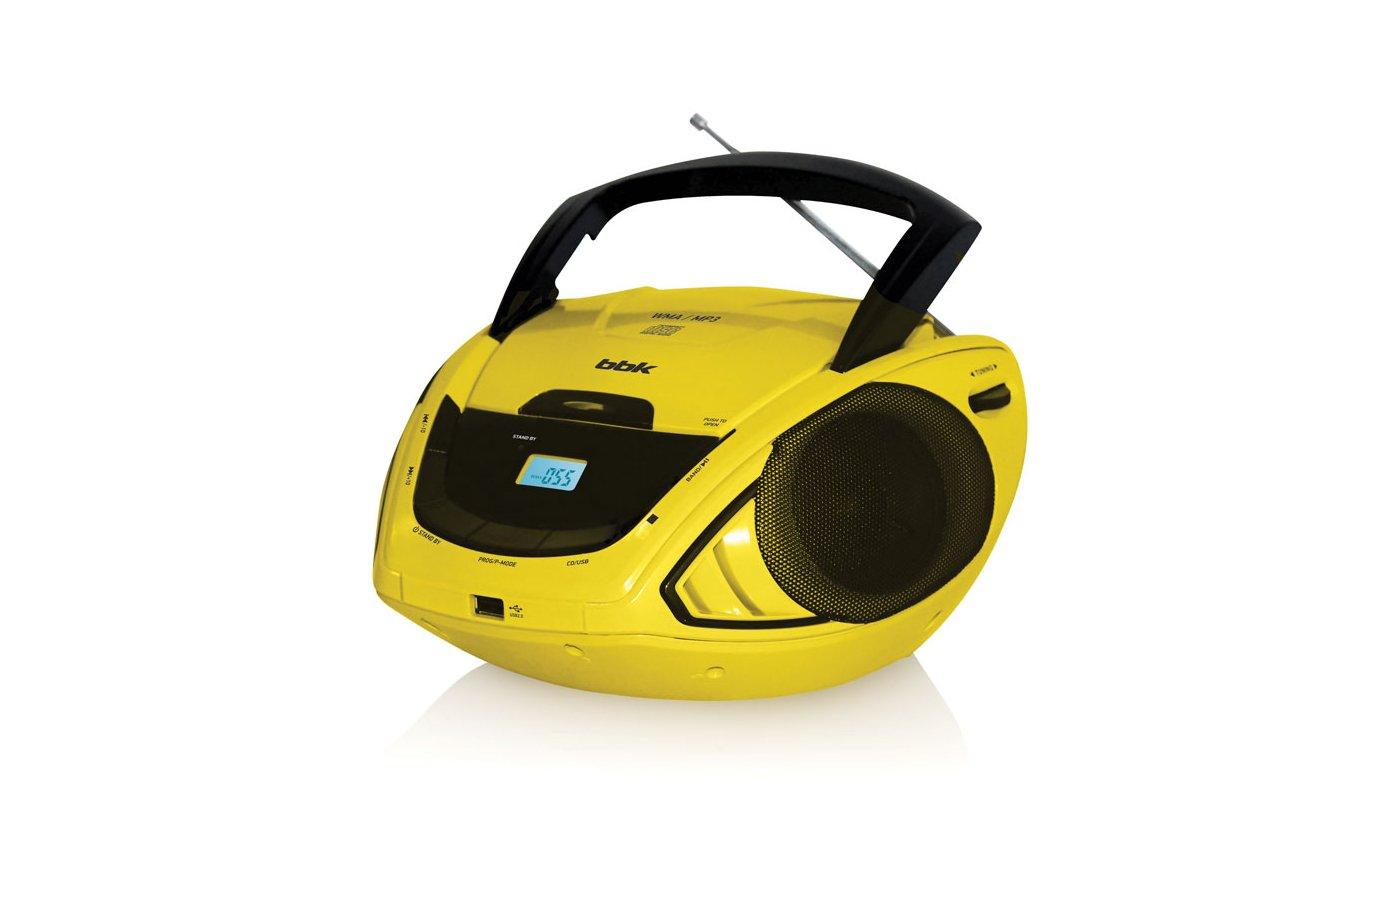 Магнитола BBK BX-190U черный/желтый